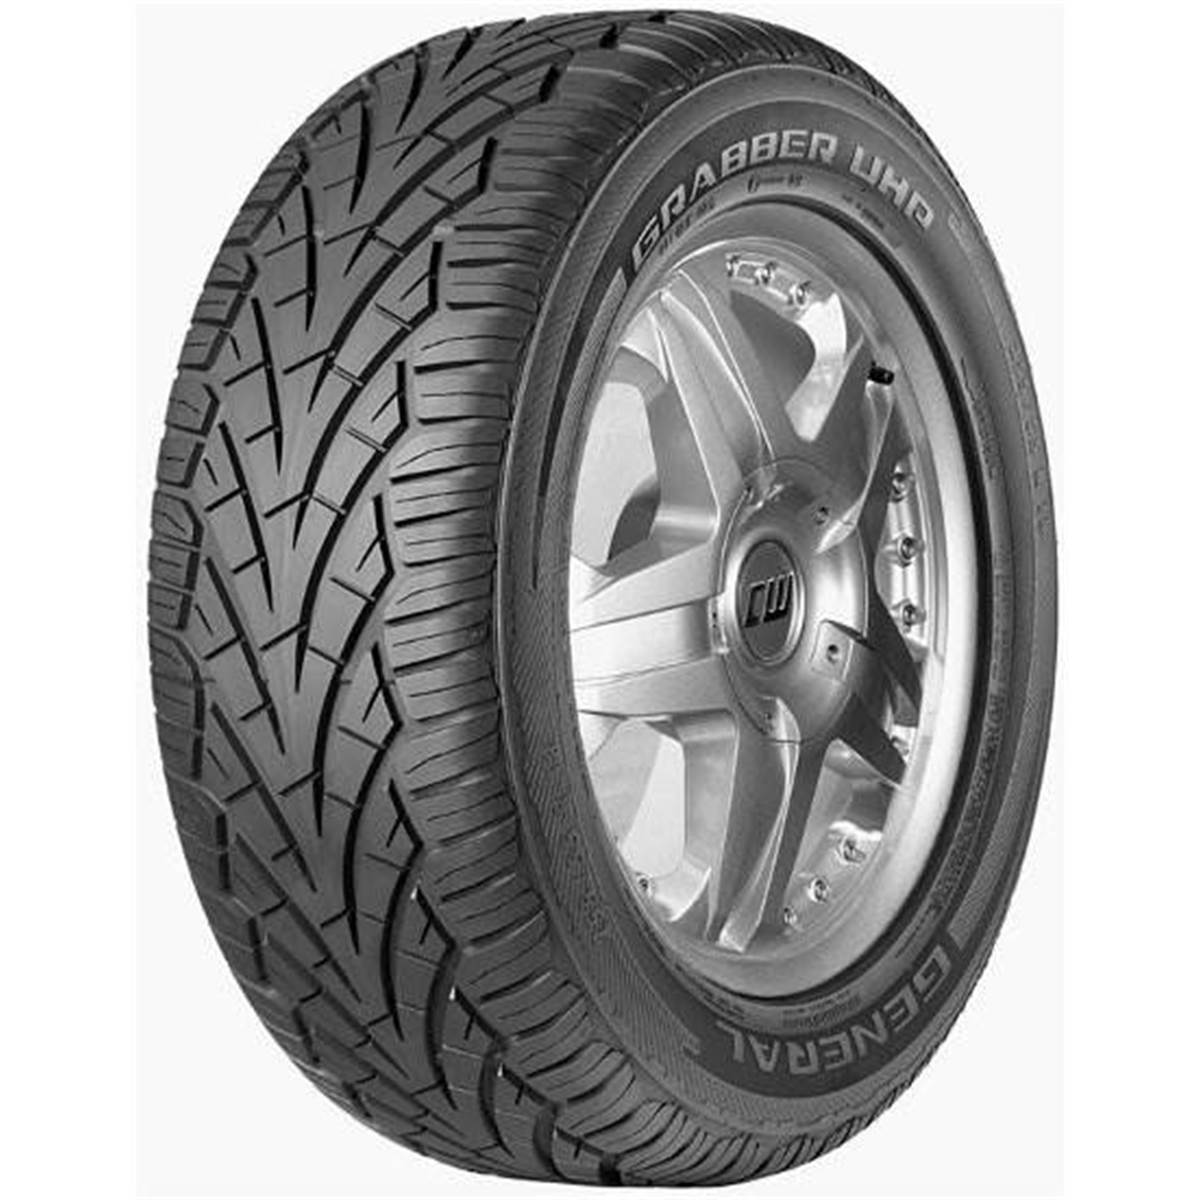 pneu general grabber uhp moins cher sur pneu pas cher. Black Bedroom Furniture Sets. Home Design Ideas